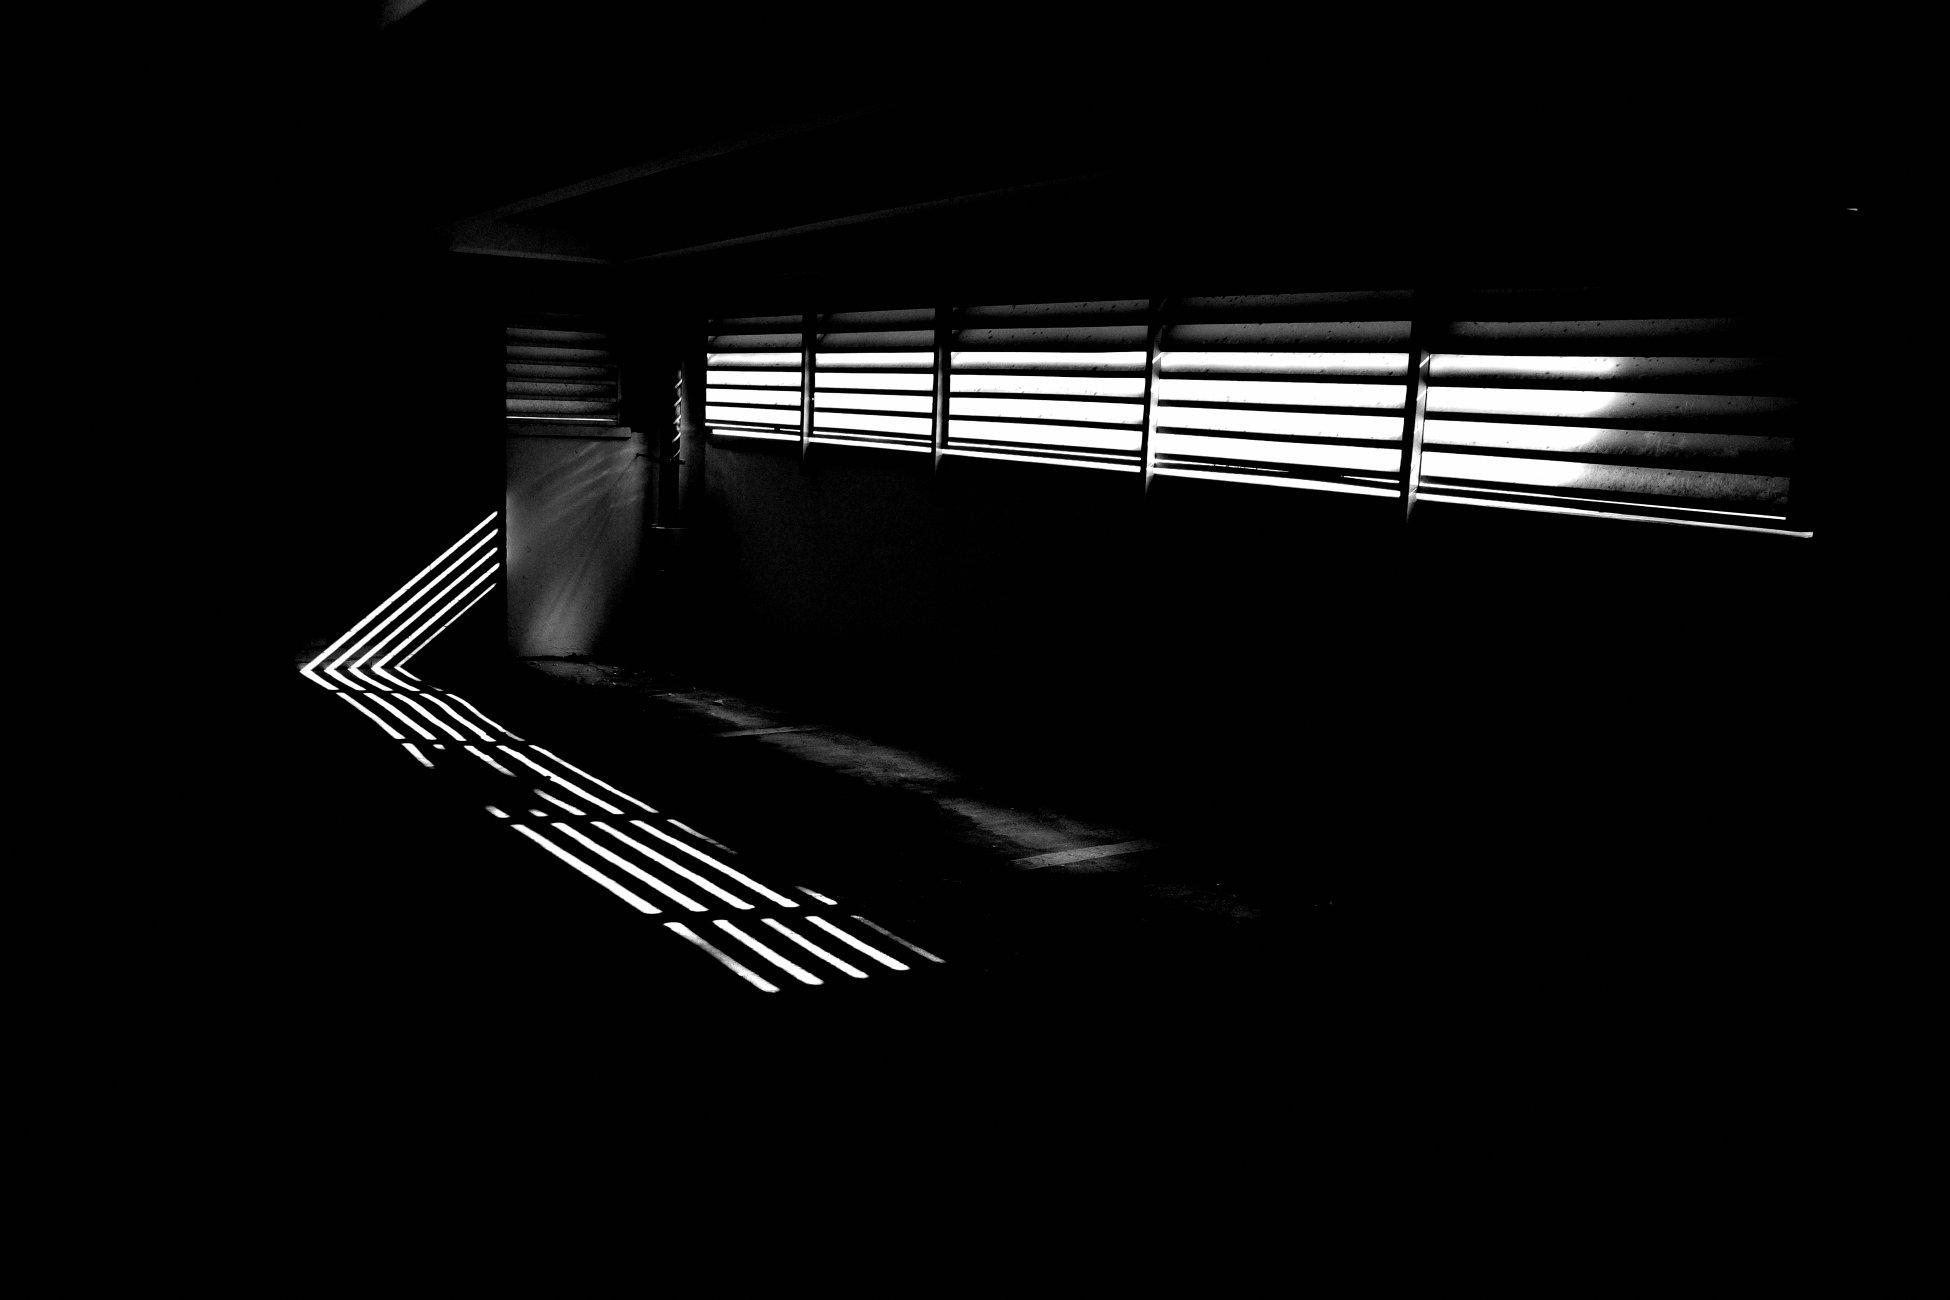 Angled Light